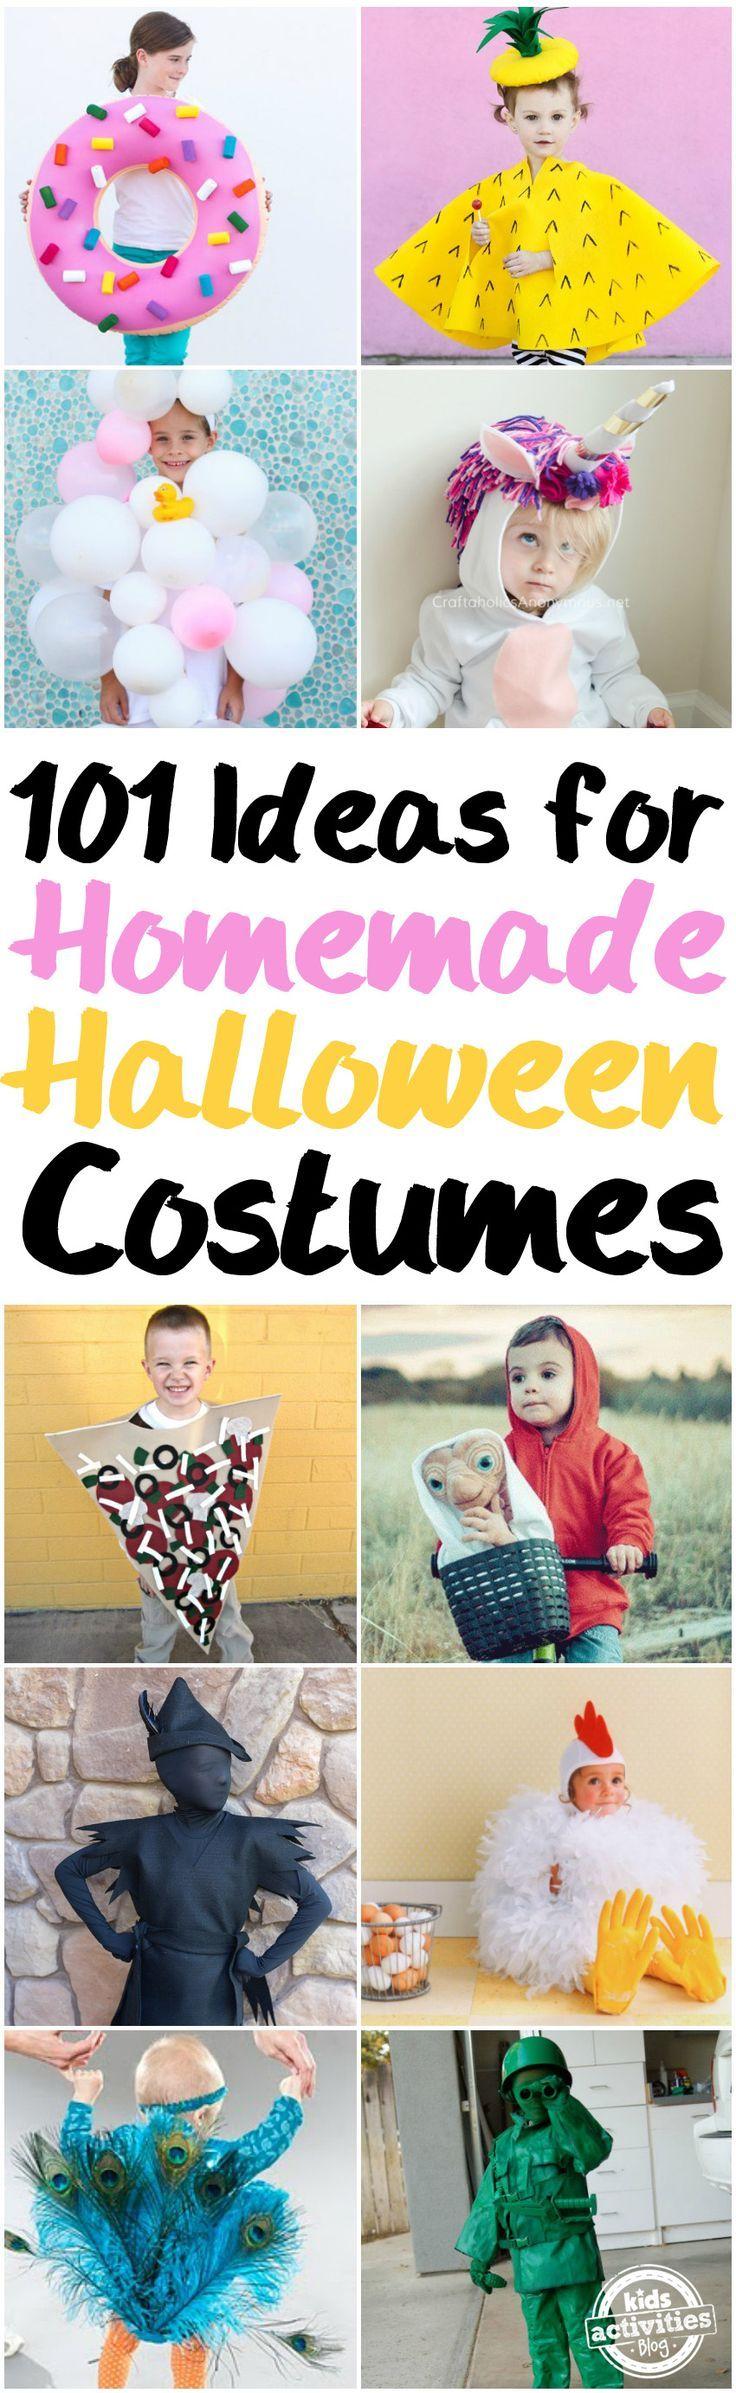 Homemade Halloween Costumes via @Holly Homer